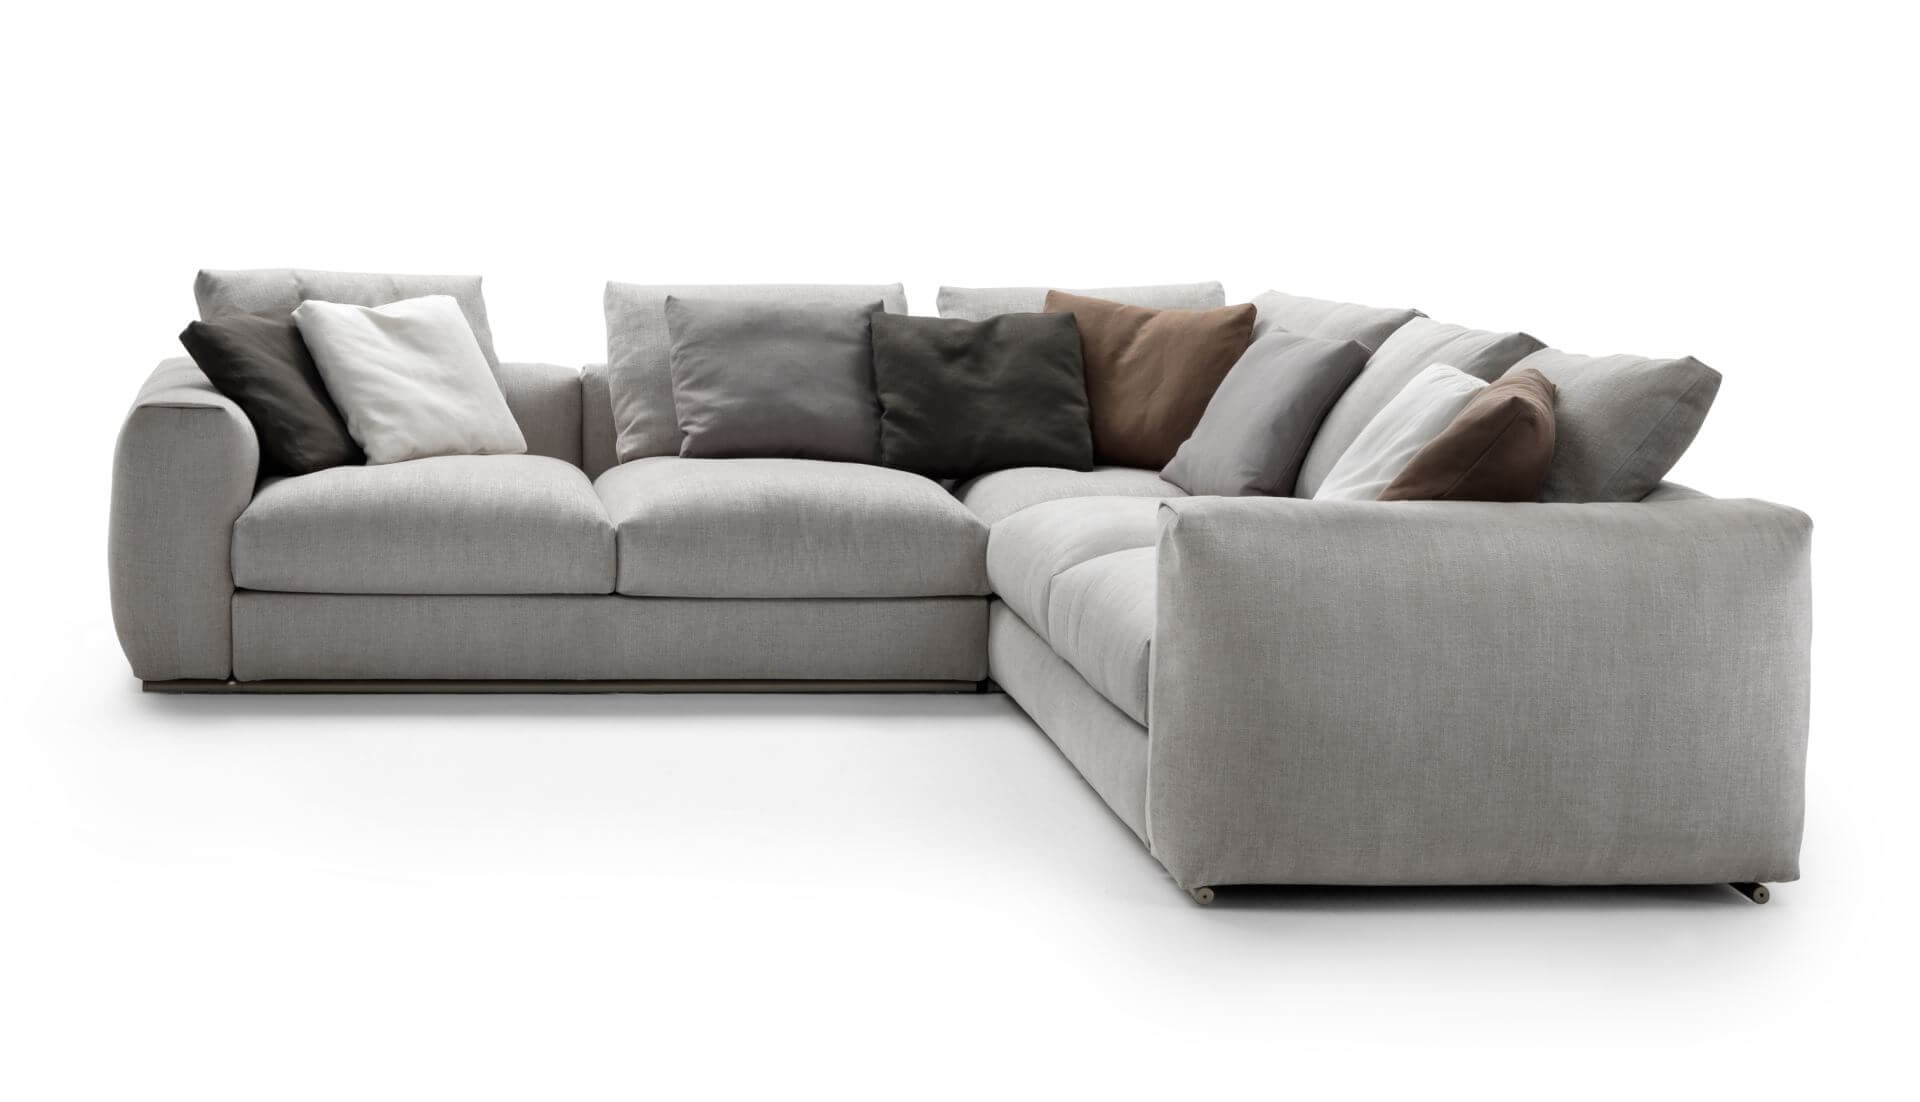 Flexform Asolo Modular Sofa – Dream Design Interiors Ltd Intended For Dream Navy 2 Piece Modular Sofas (View 6 of 15)